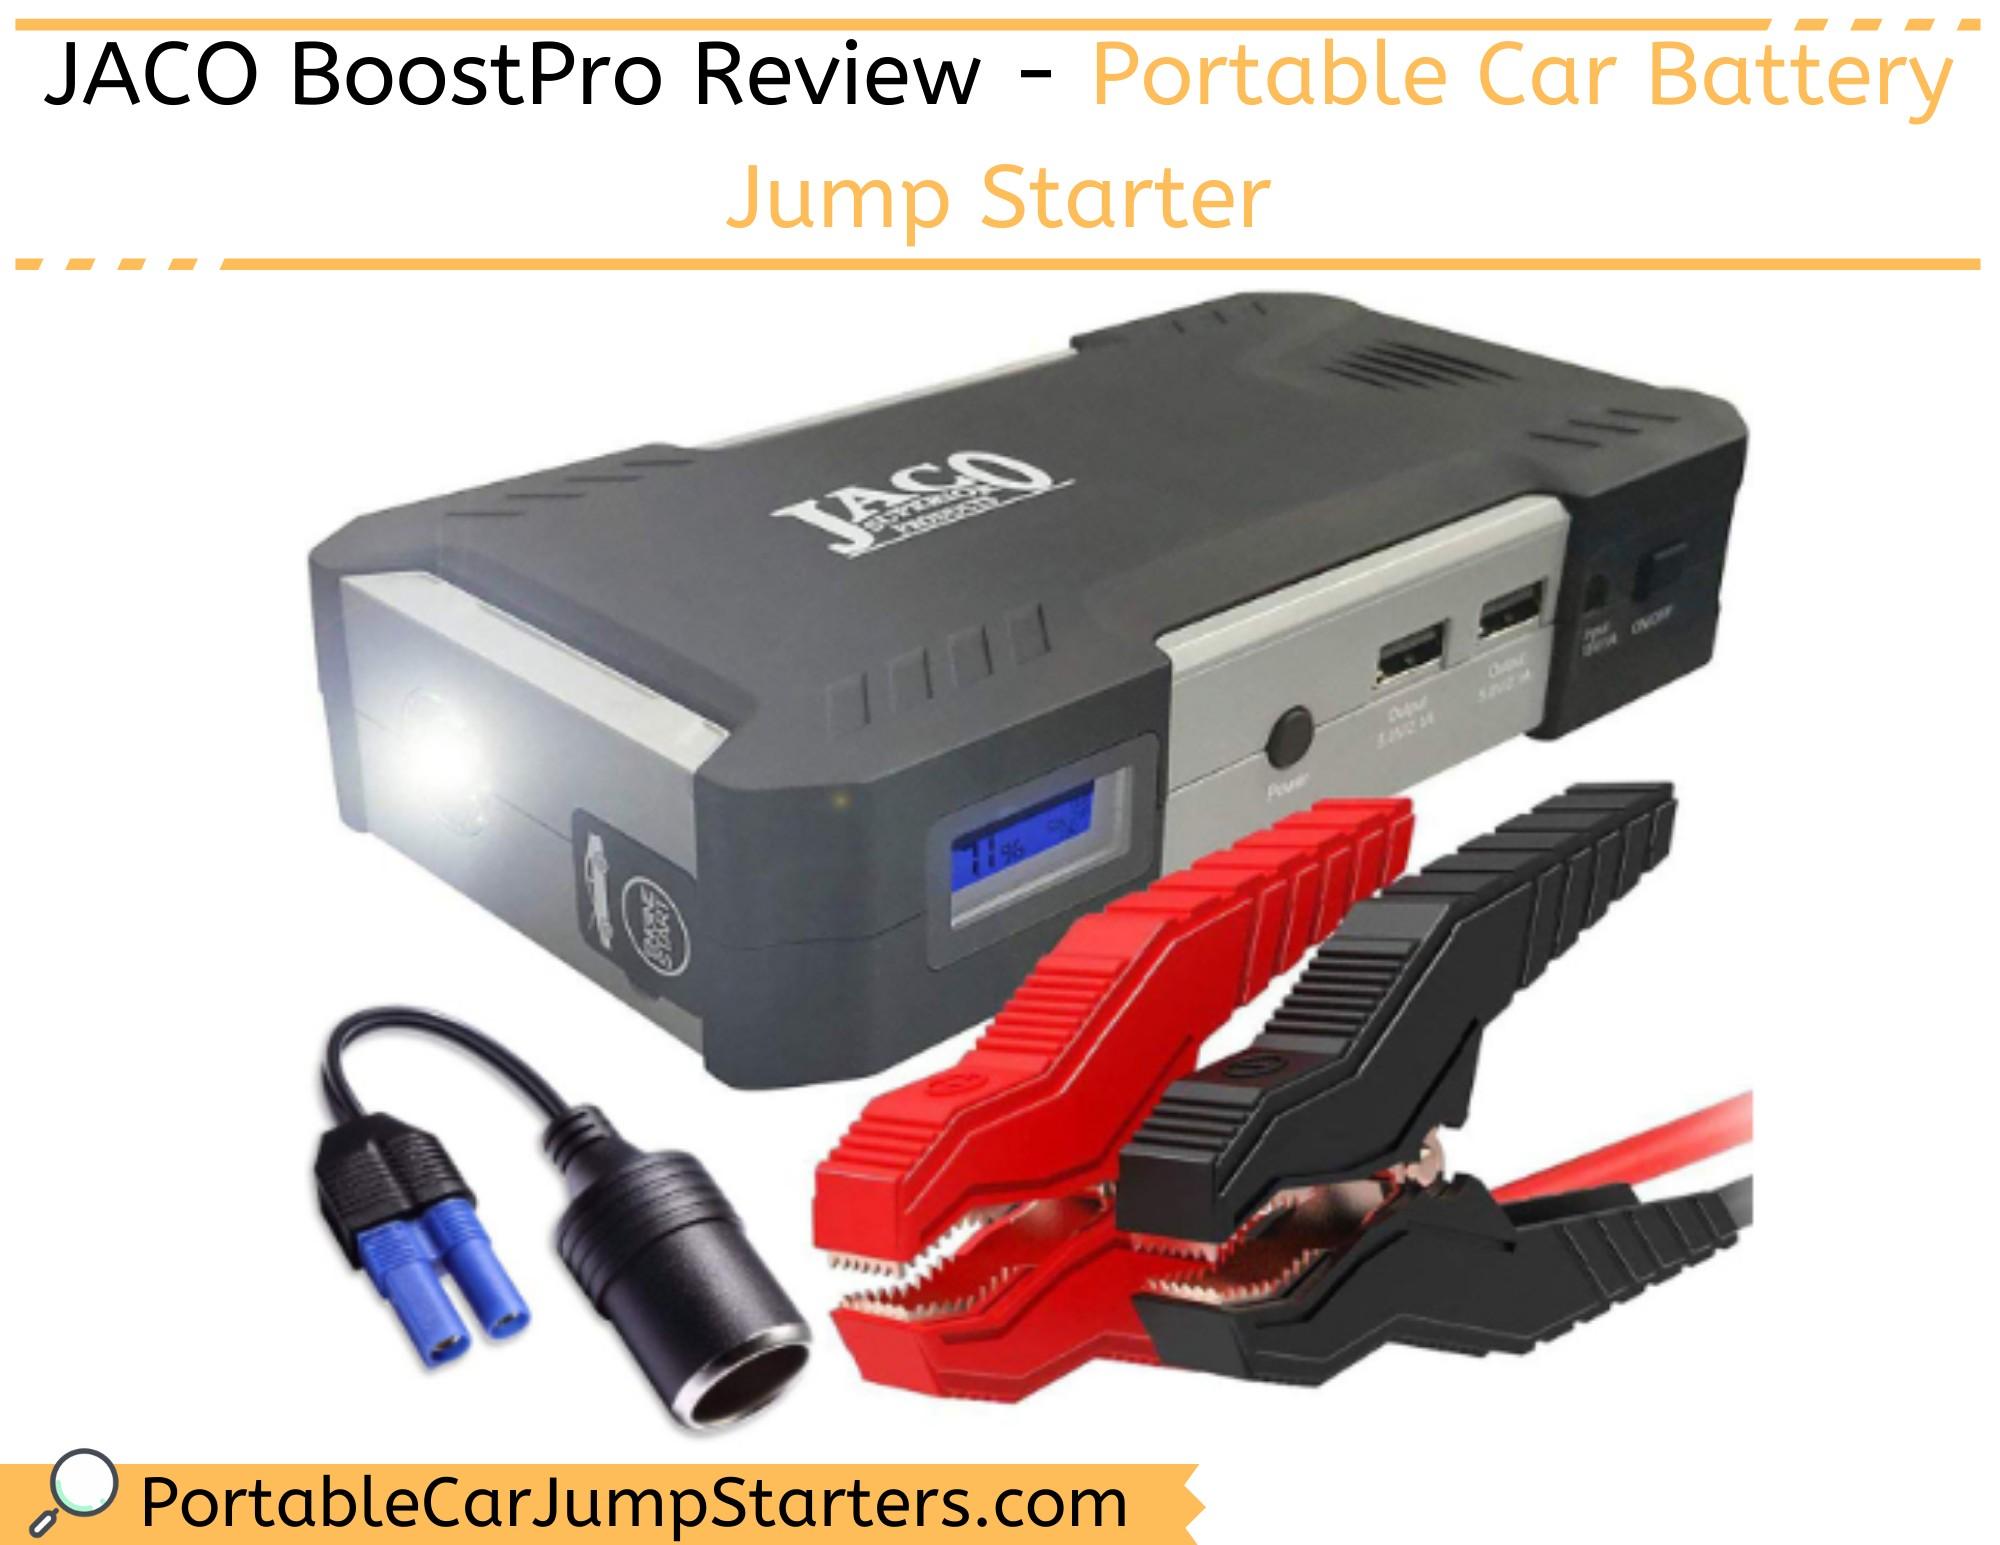 Thumbnail for JACO BoostPro Review – Portable Car Battery Jump Starter